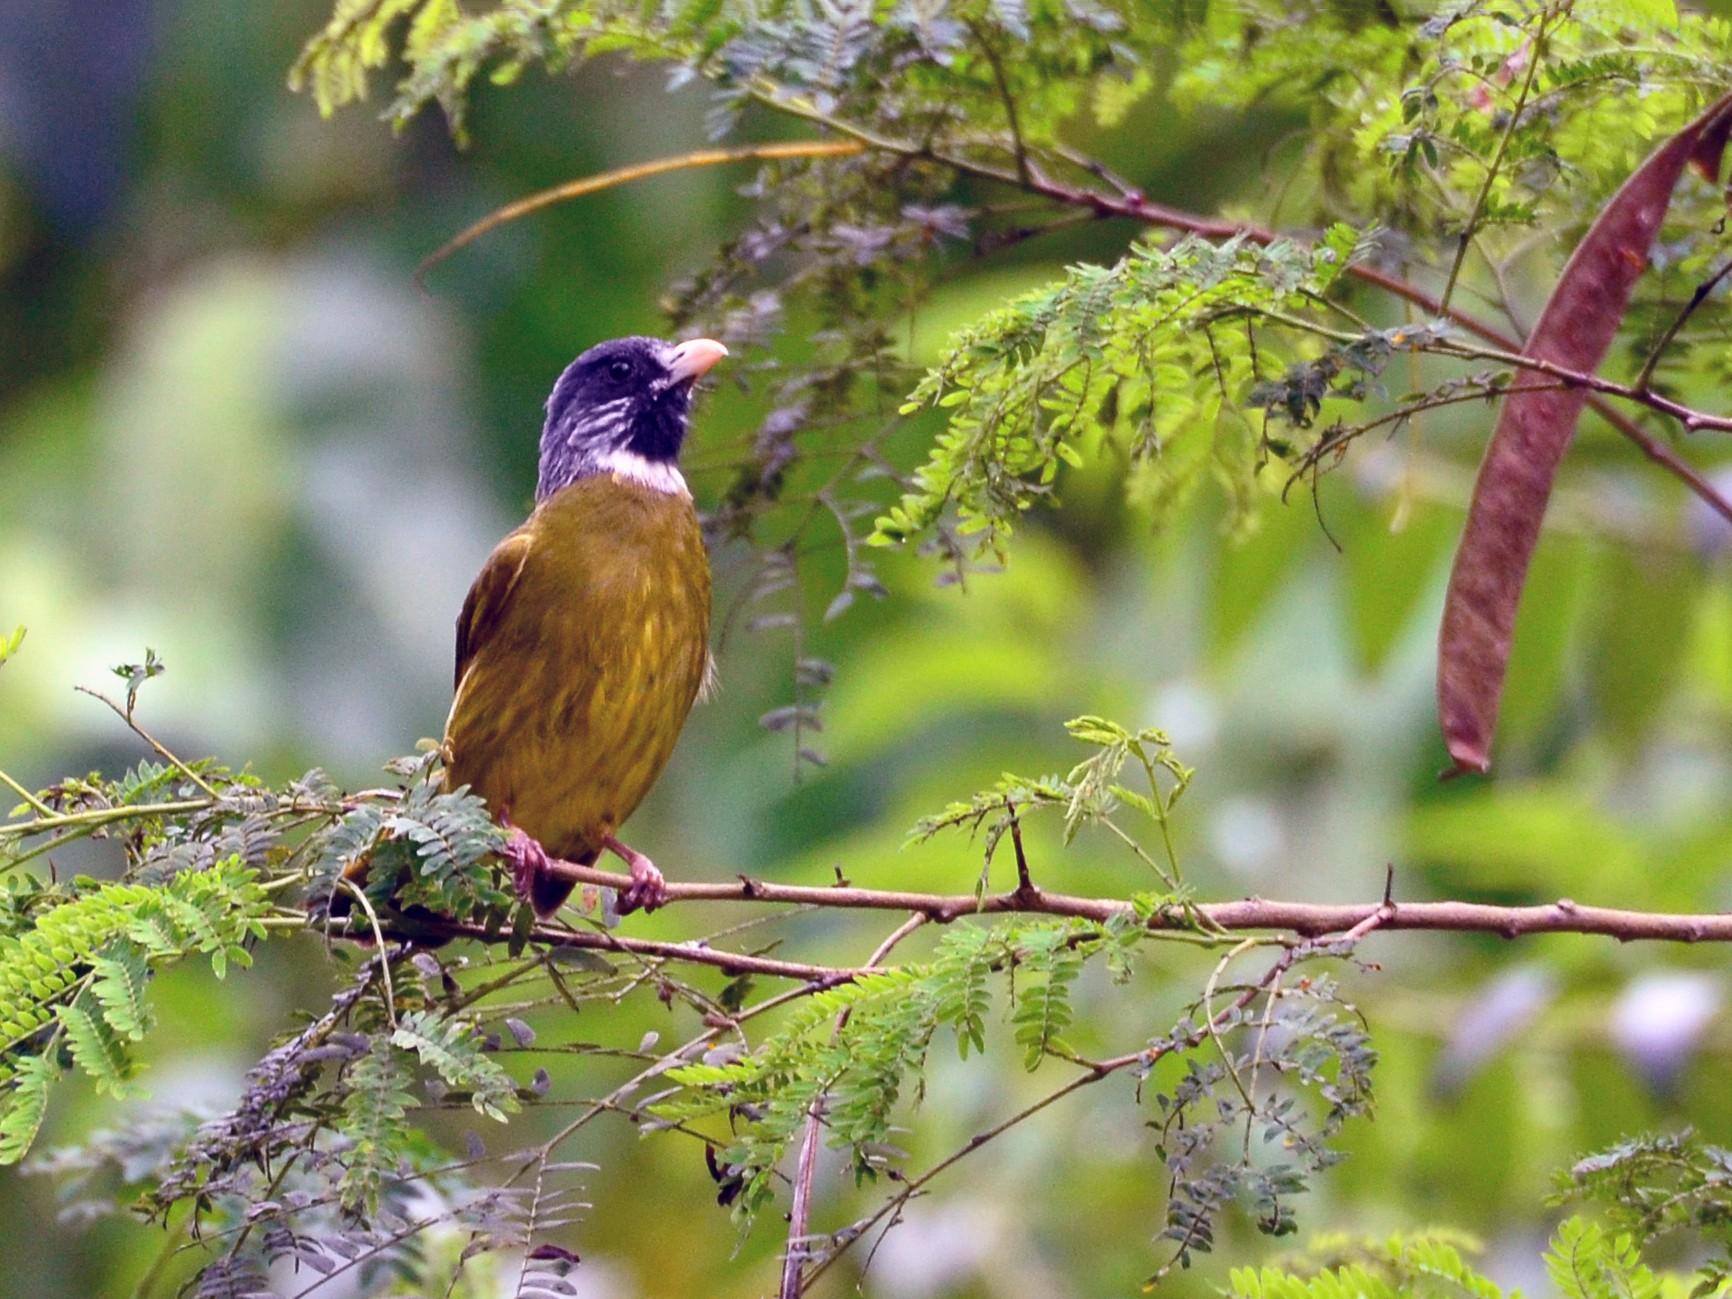 Collared Finchbill - Paul Shaffner